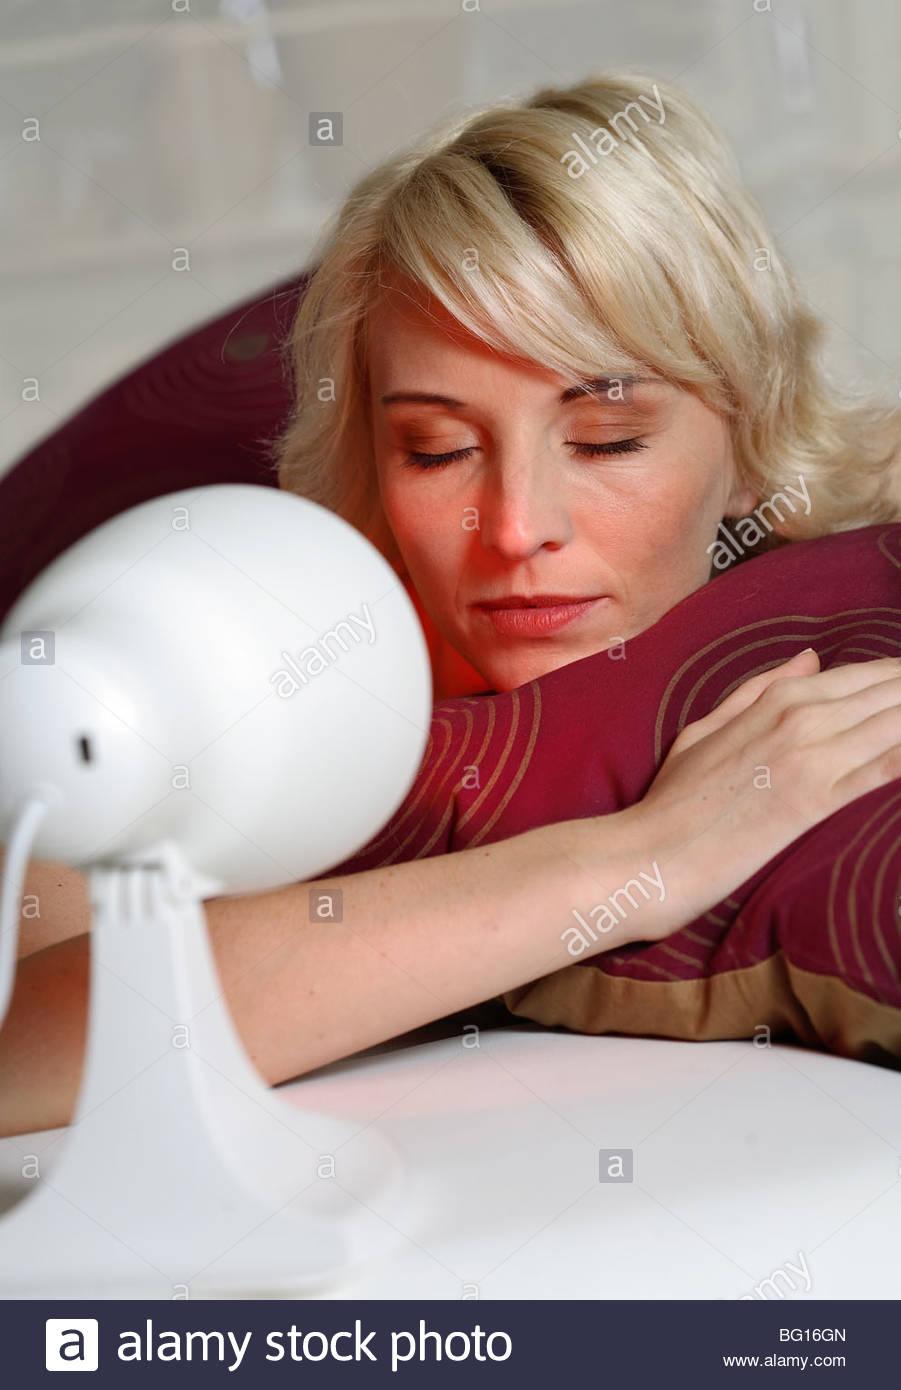 blond woman lying on sofa - Stock Image